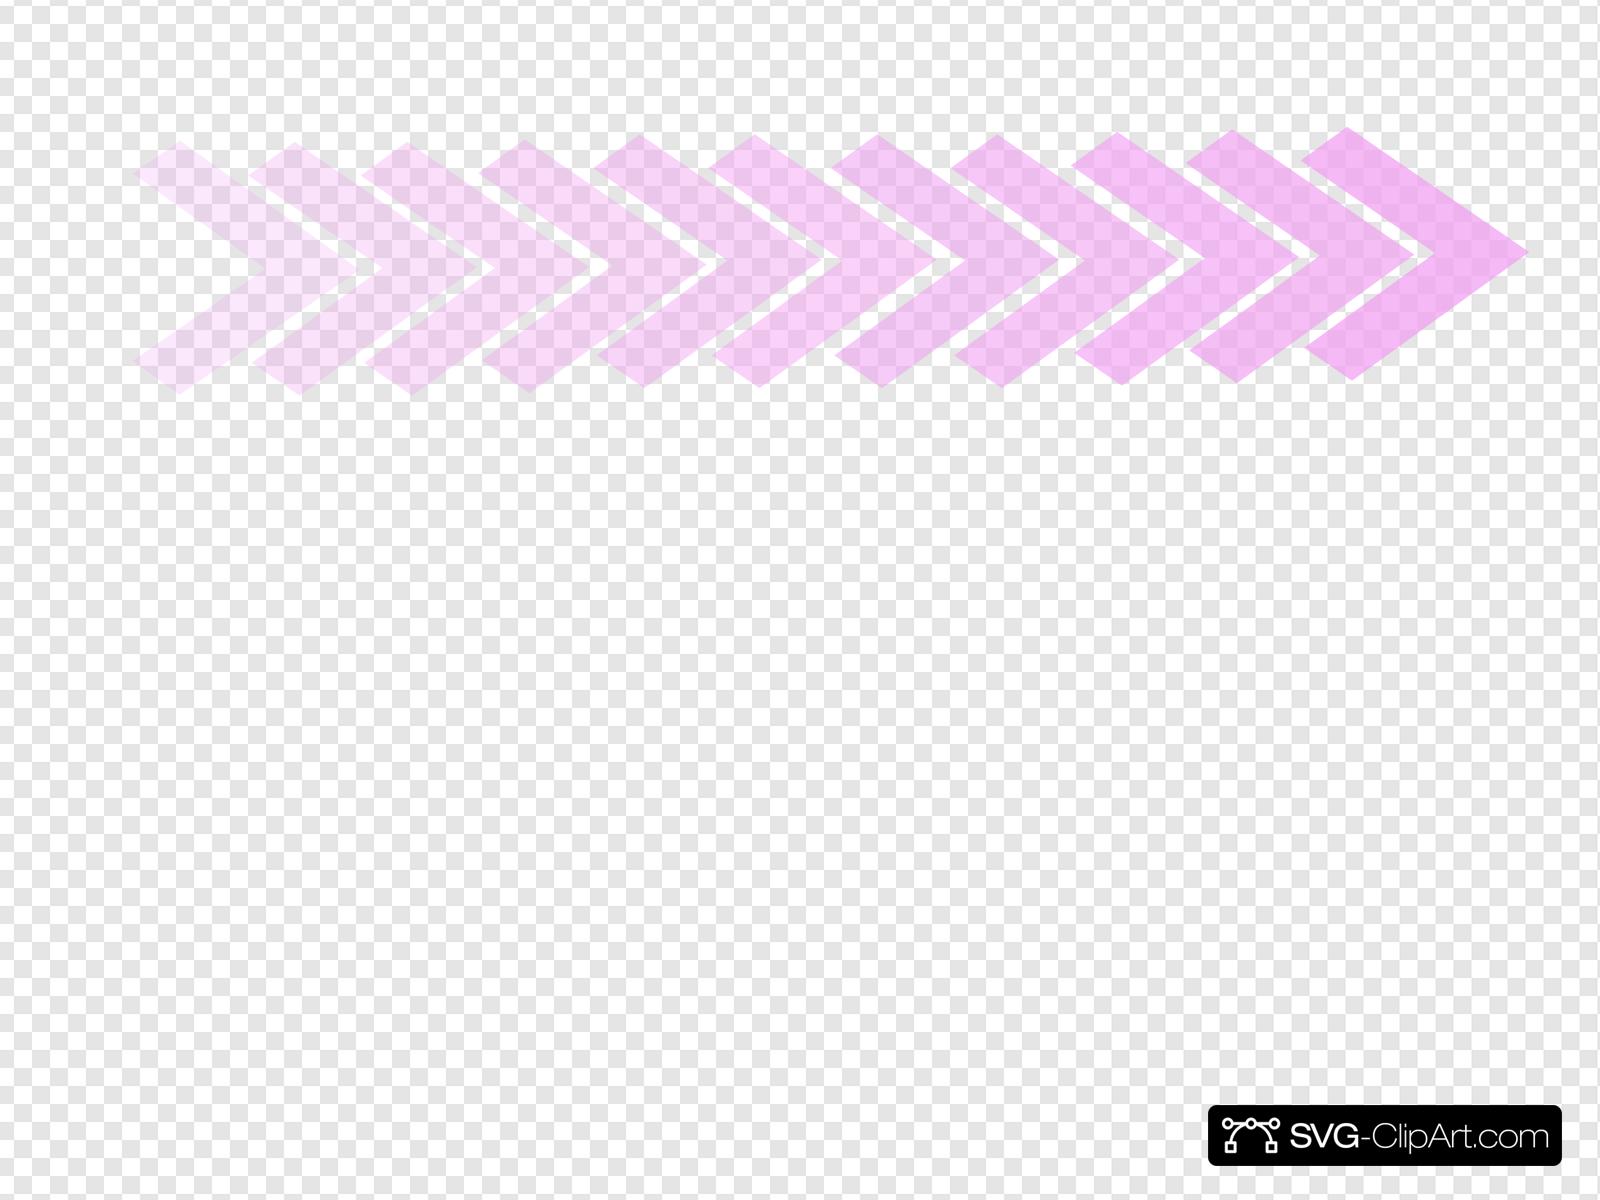 Pink Ombre Chevron Arrow Clip art, Icon and SVG.